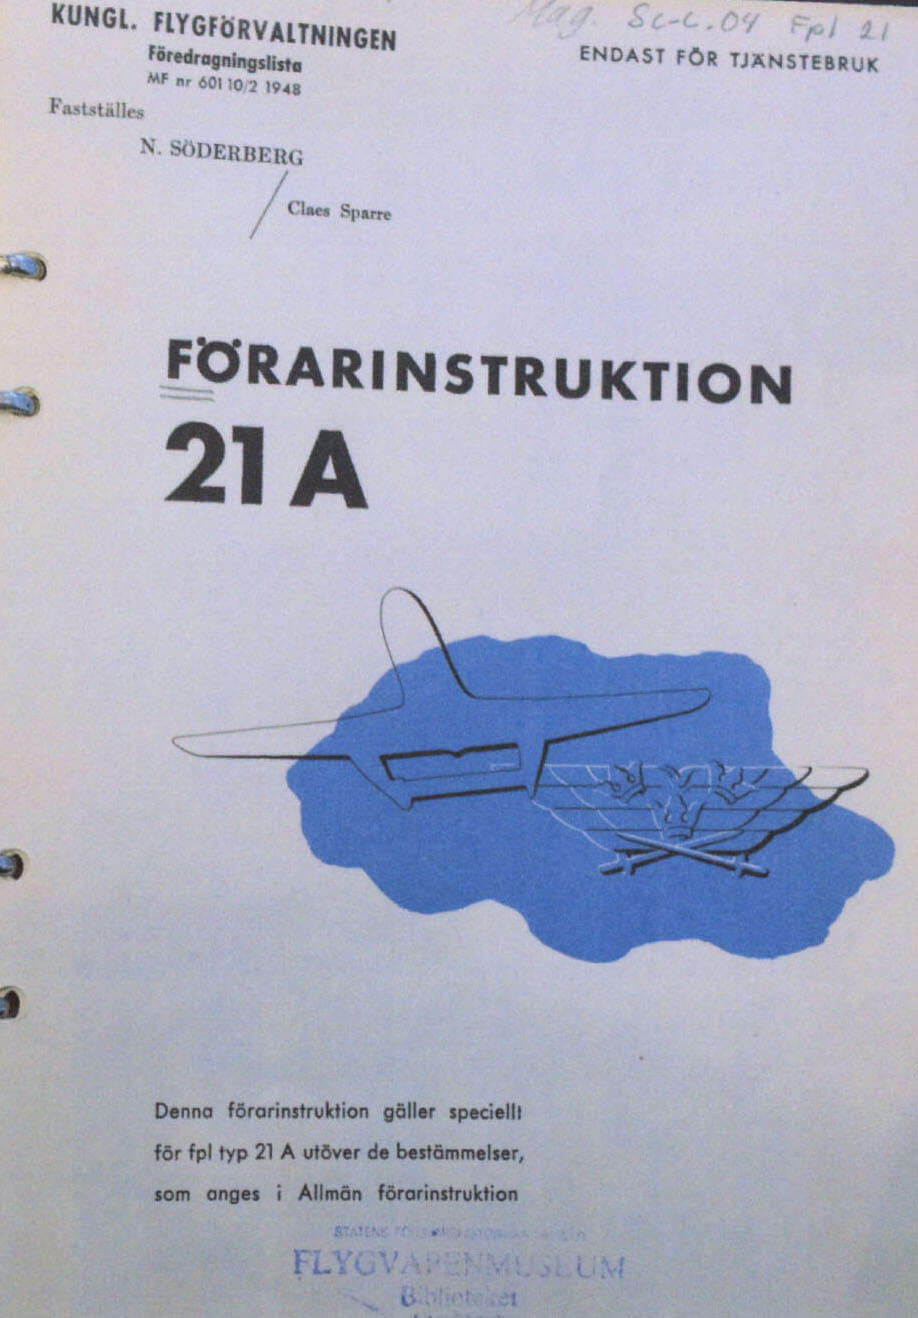 Flight Manual for the Saab J21